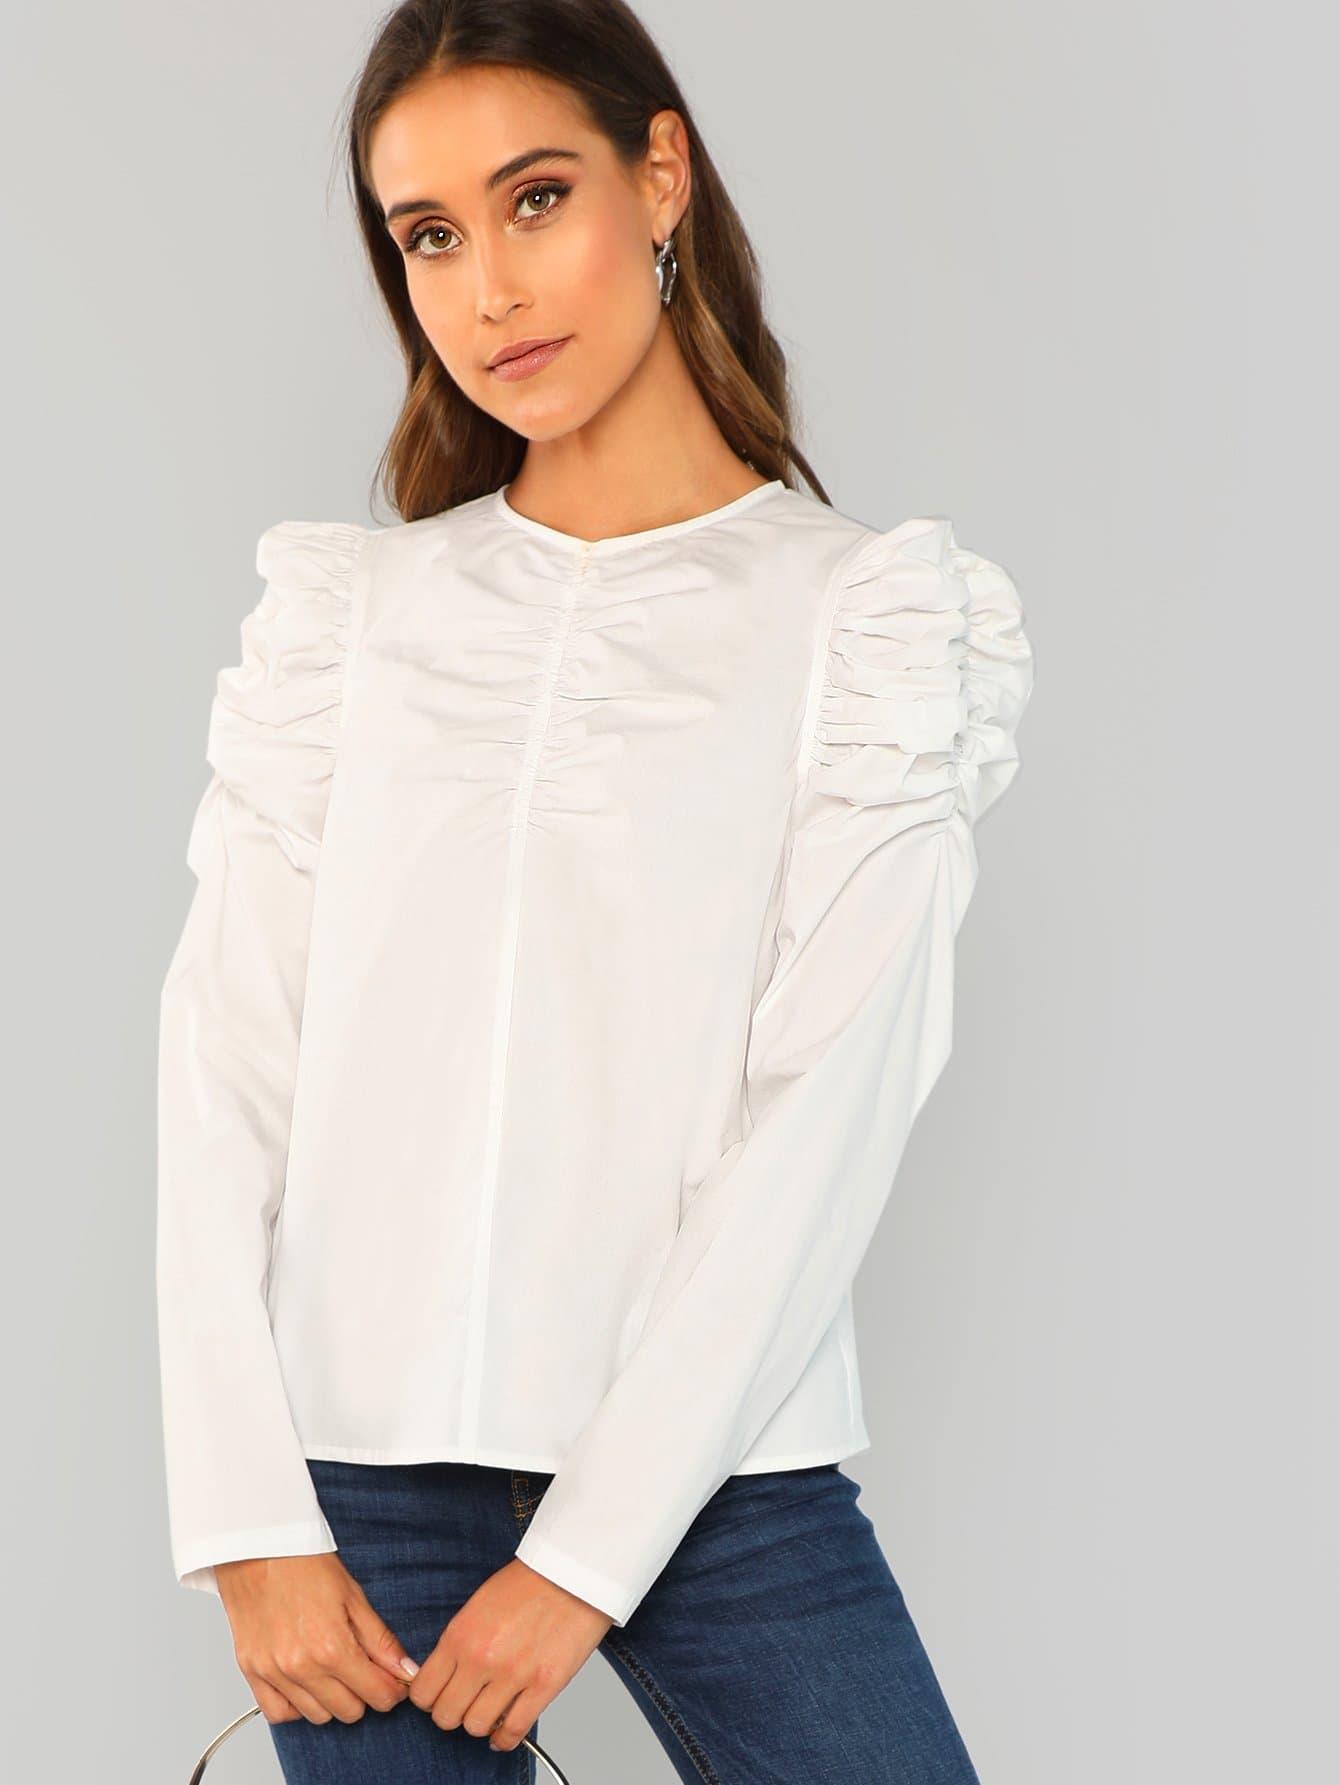 Купить Блуза с рукав-фонариками, Anna Herrin, SheIn